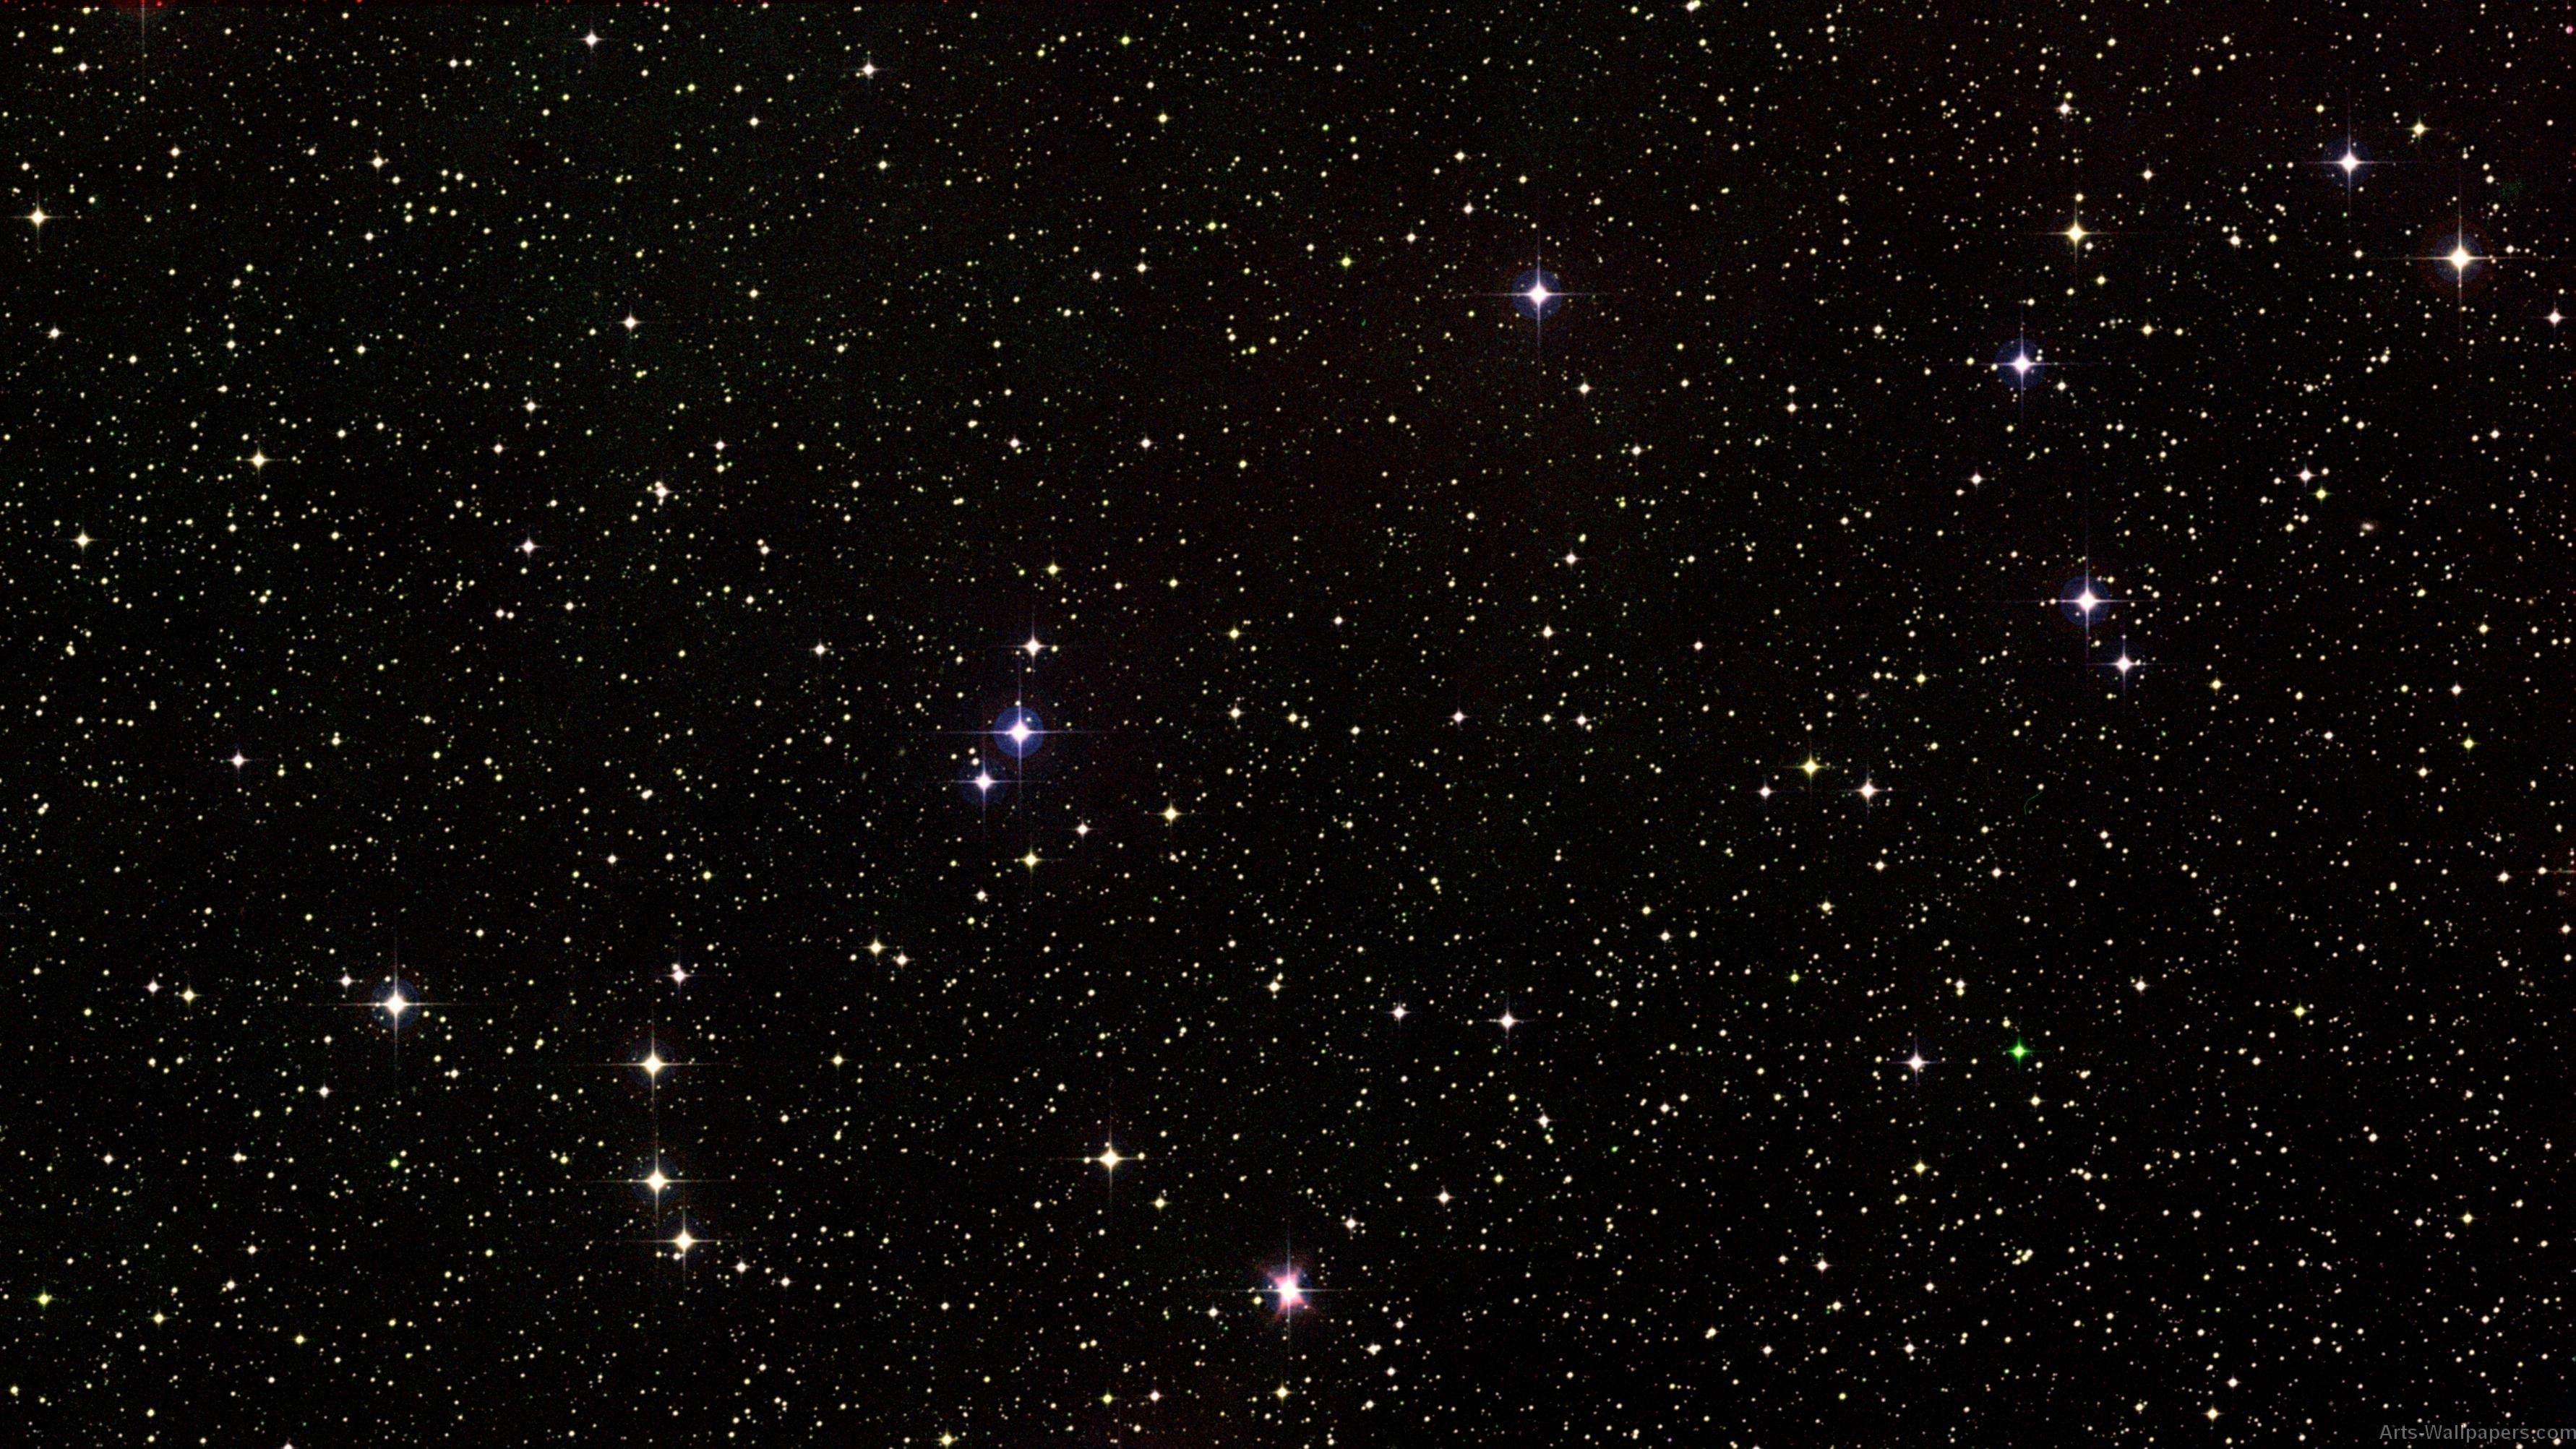 star wars star background ·① download free wallpapers for desktop